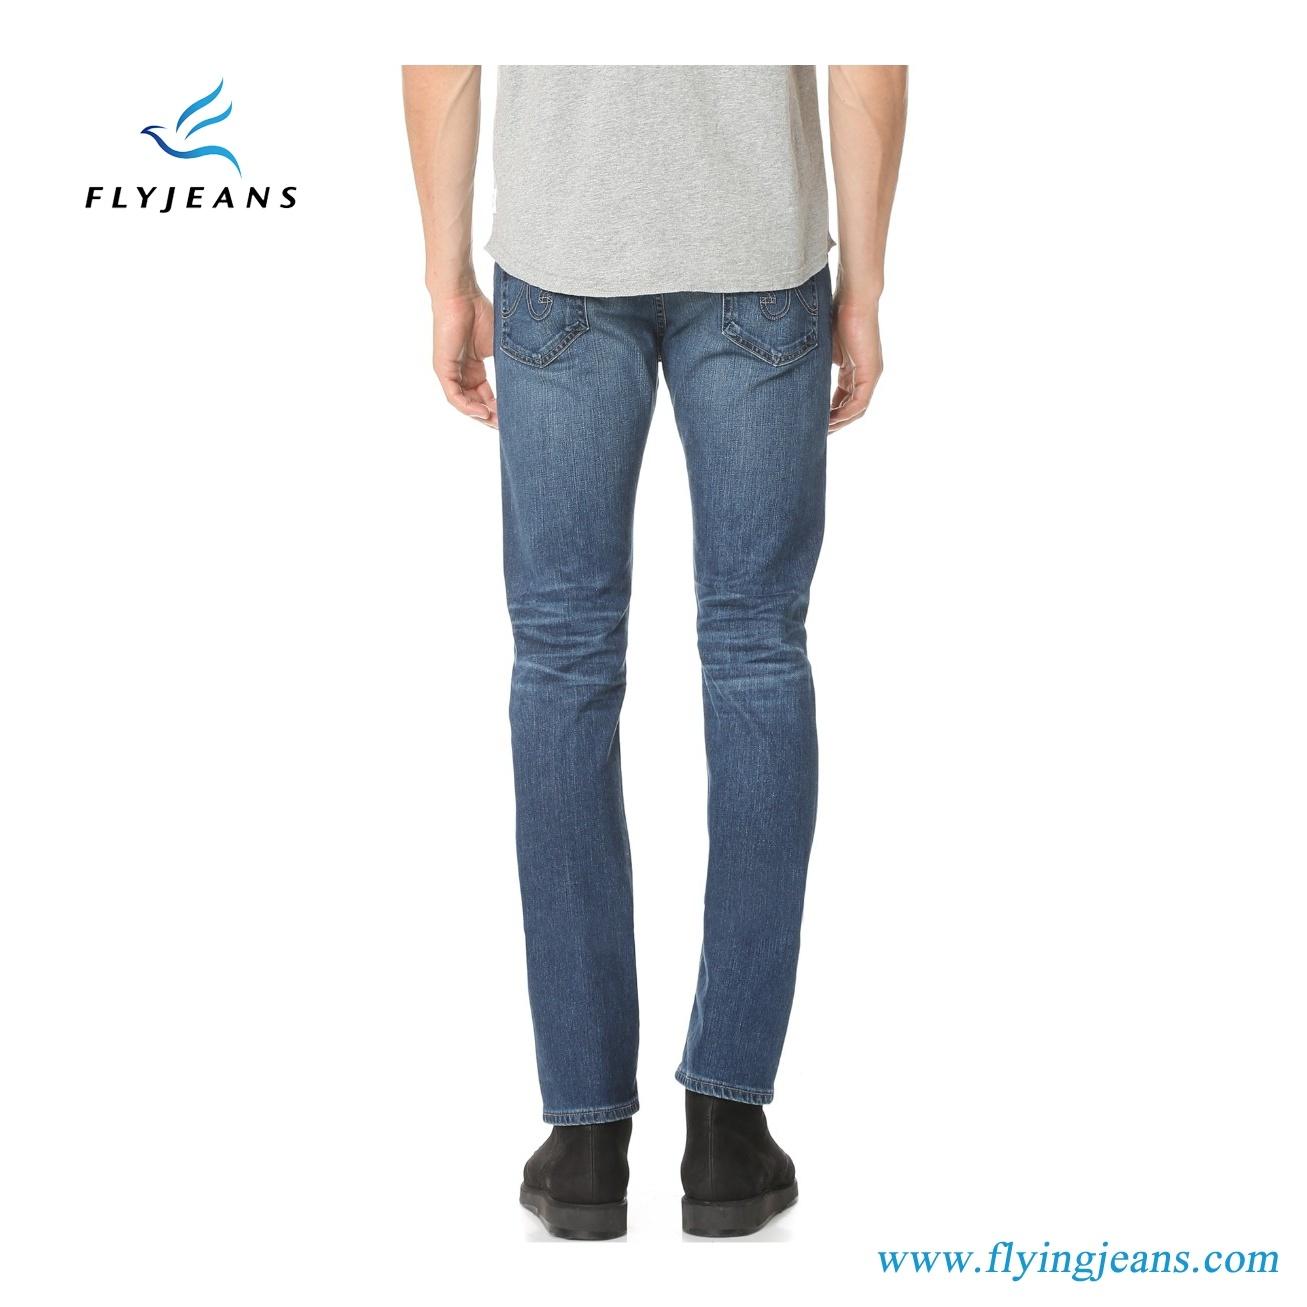 2017 Latest Fashion Blue Stretch Denim Ripped Men Jeans (Pants E. P. 4129)